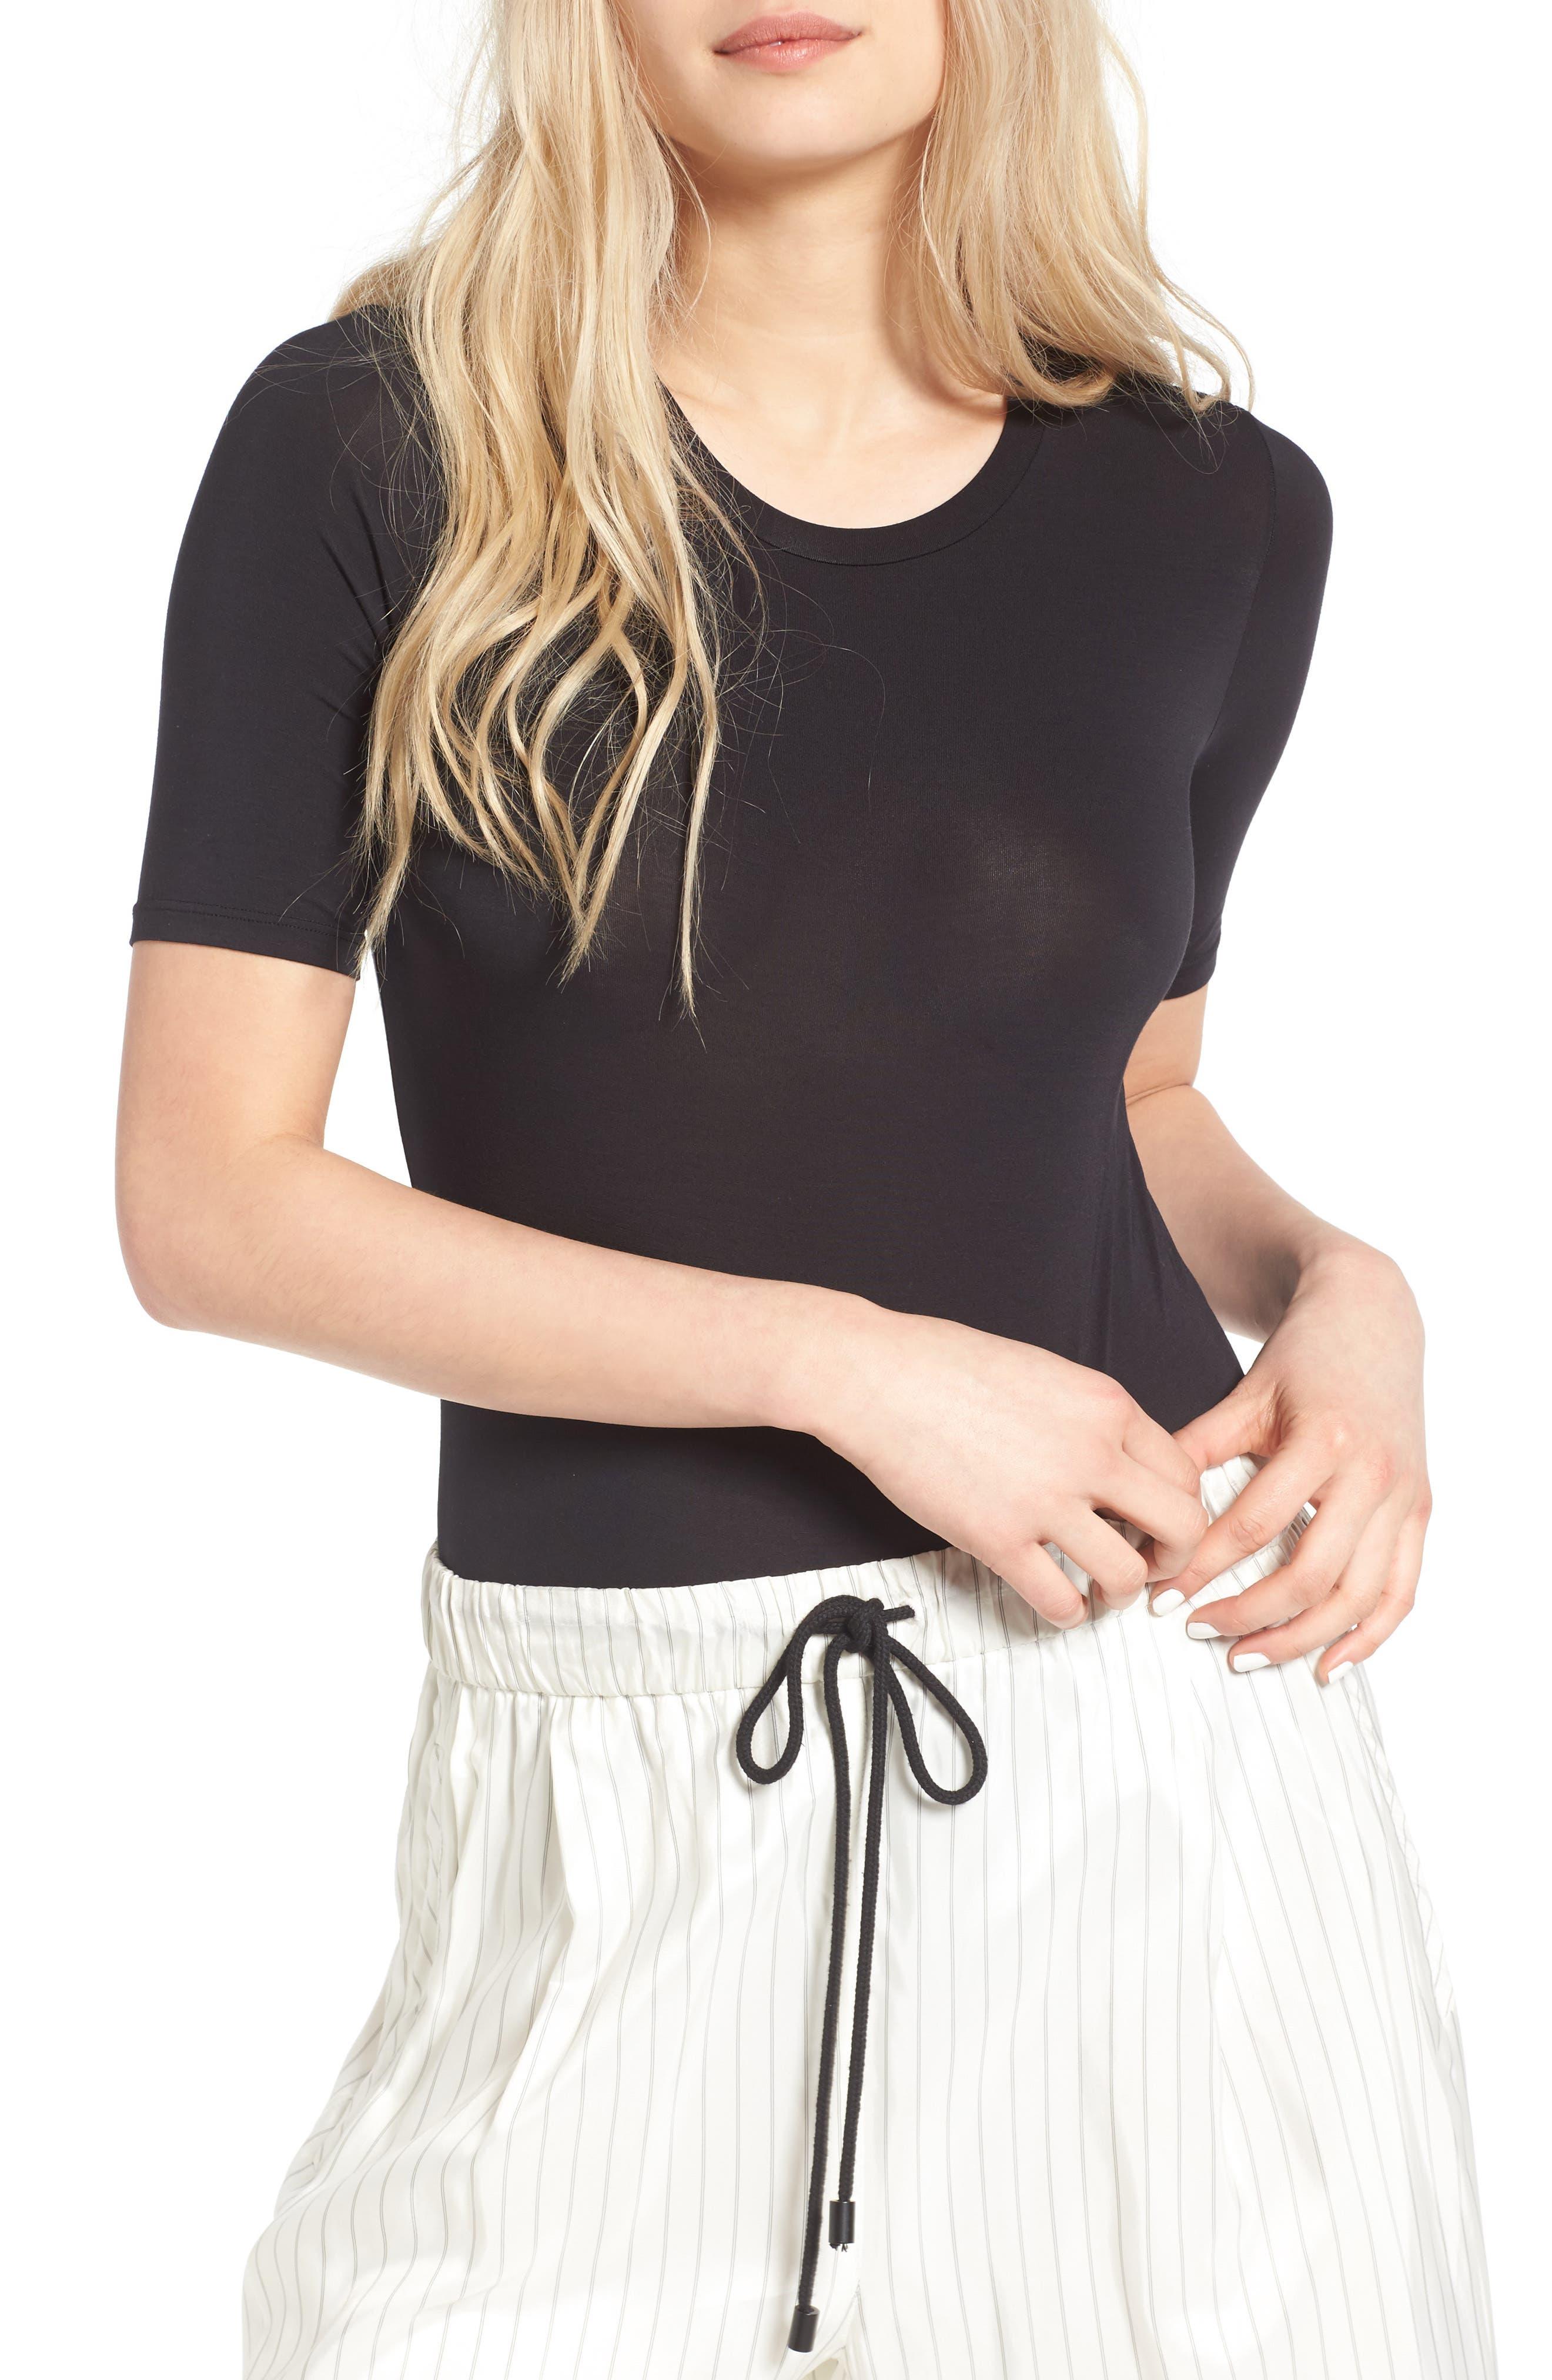 Main Image - Tuxe Keynote Bodysuit